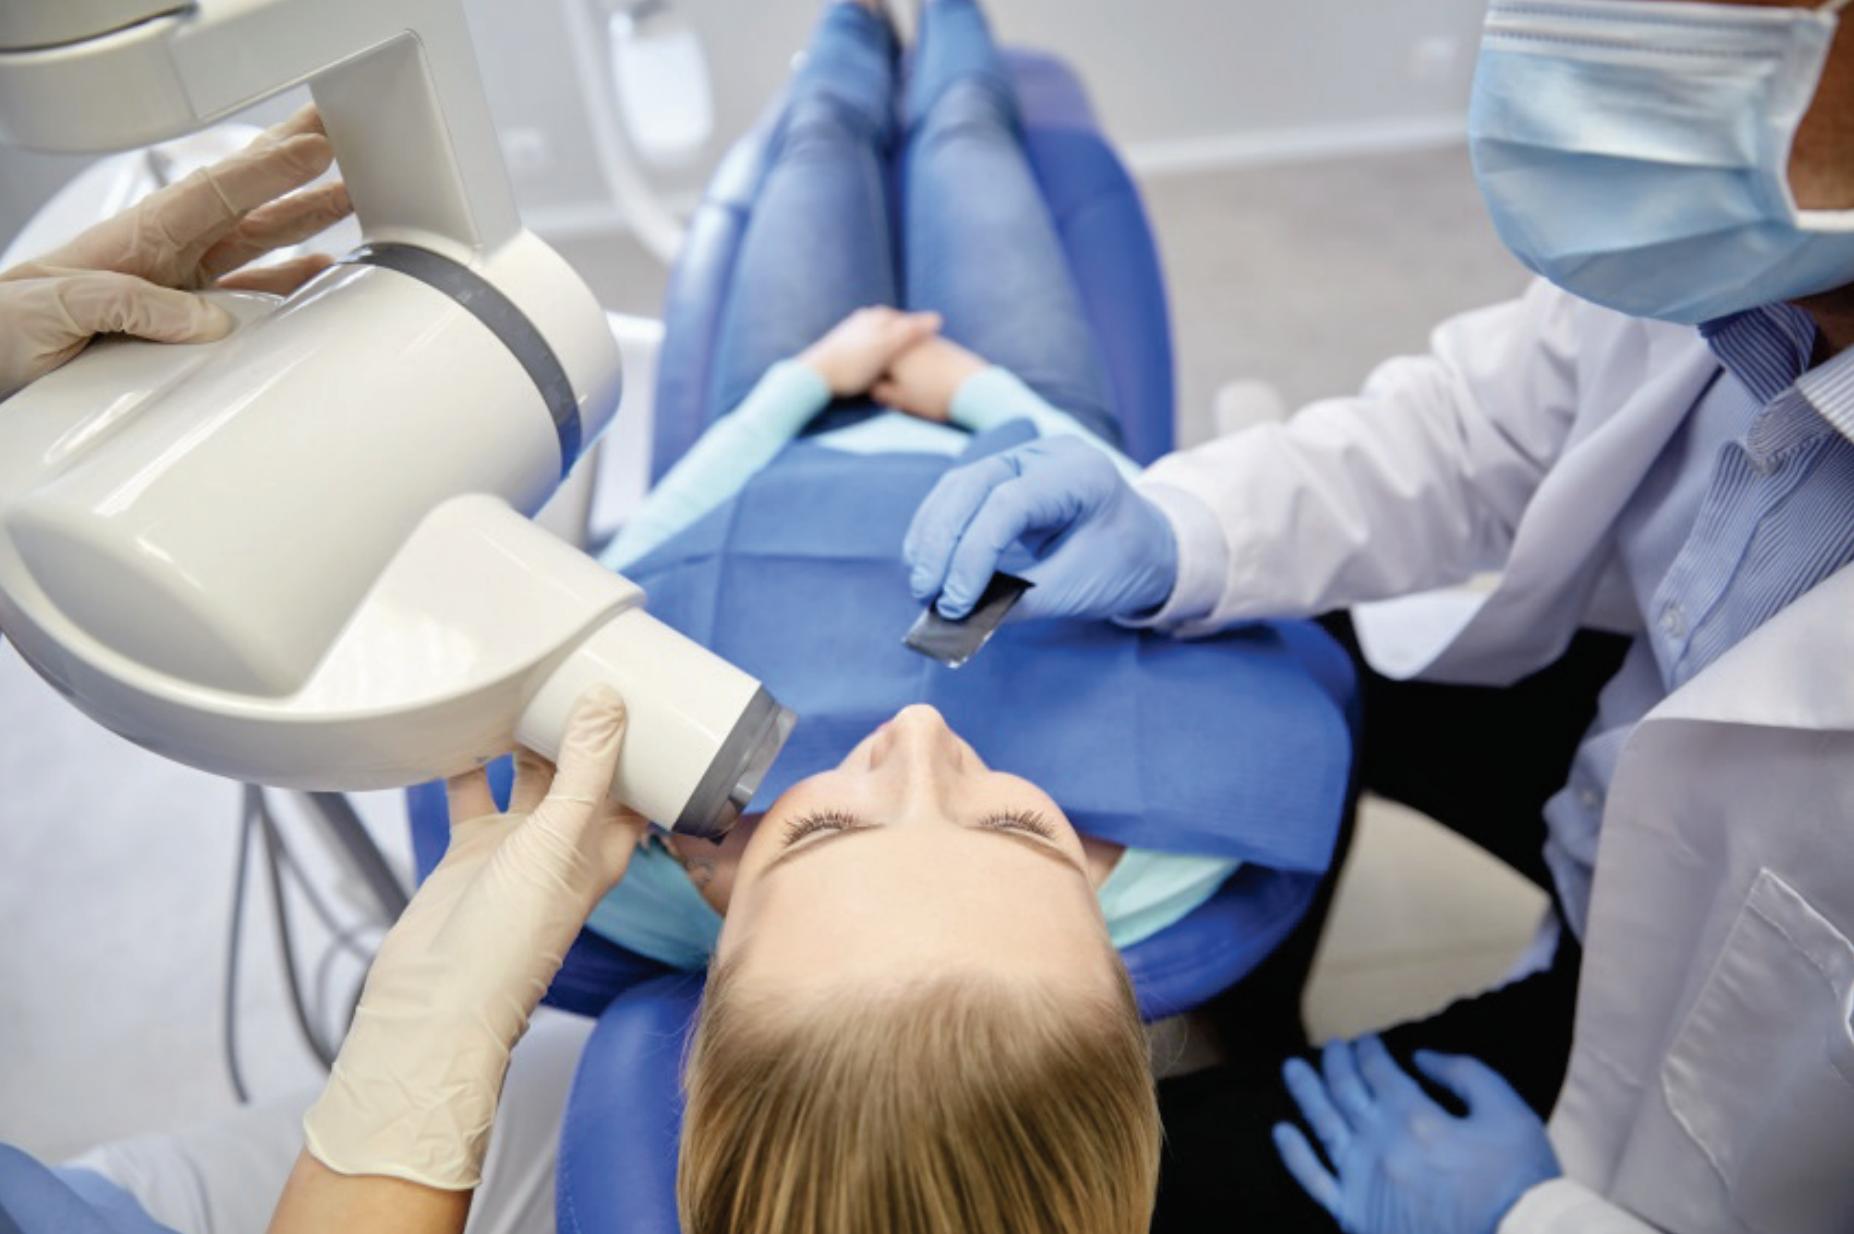 Dental X-Ray in progress